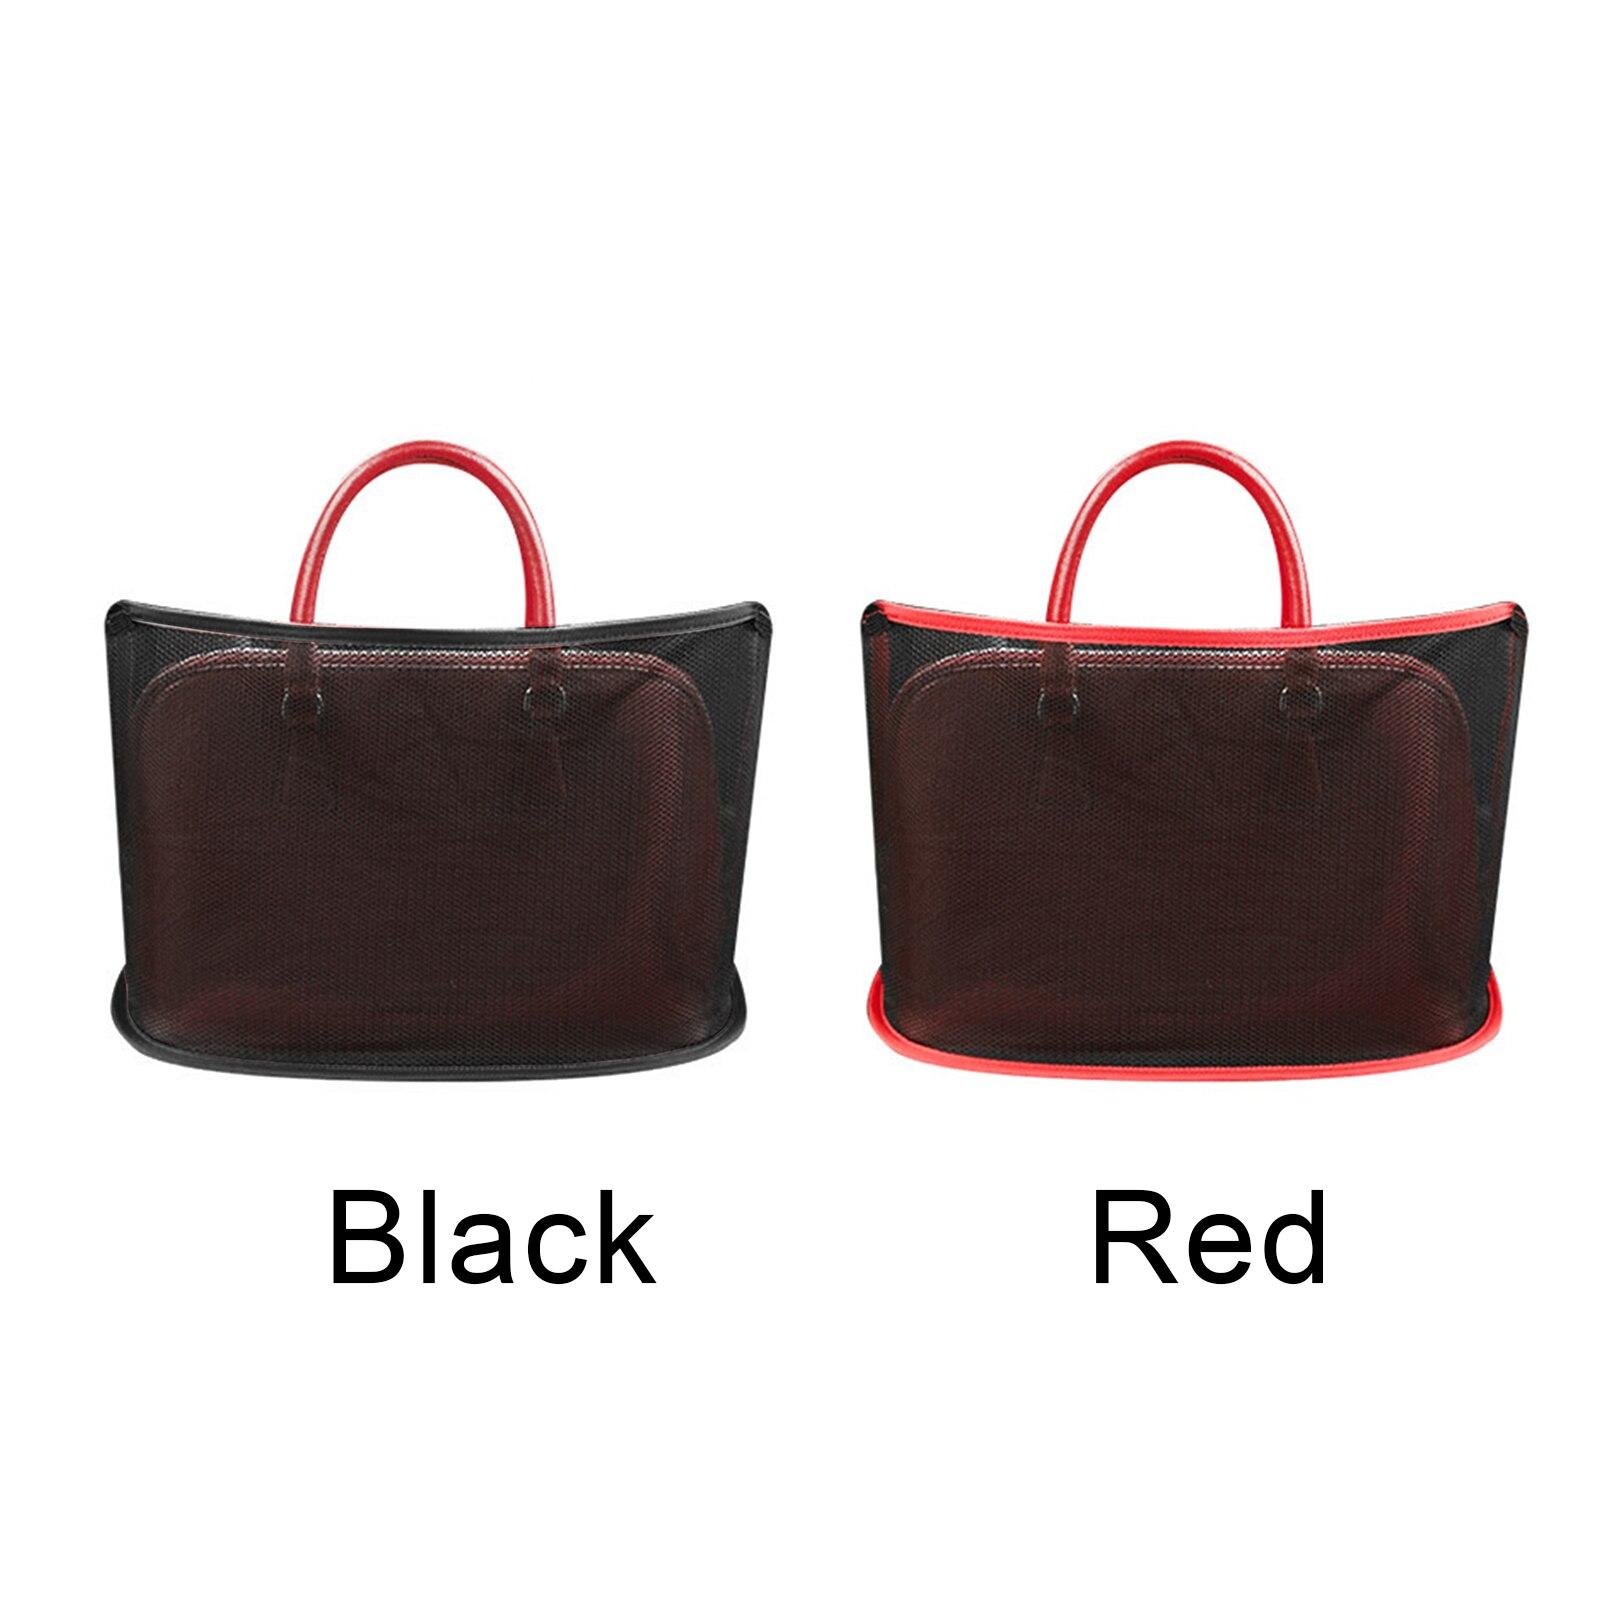 Car Net Pocket Handbag Holder for Handbag Bag Documents Phone Valuable Items SER88